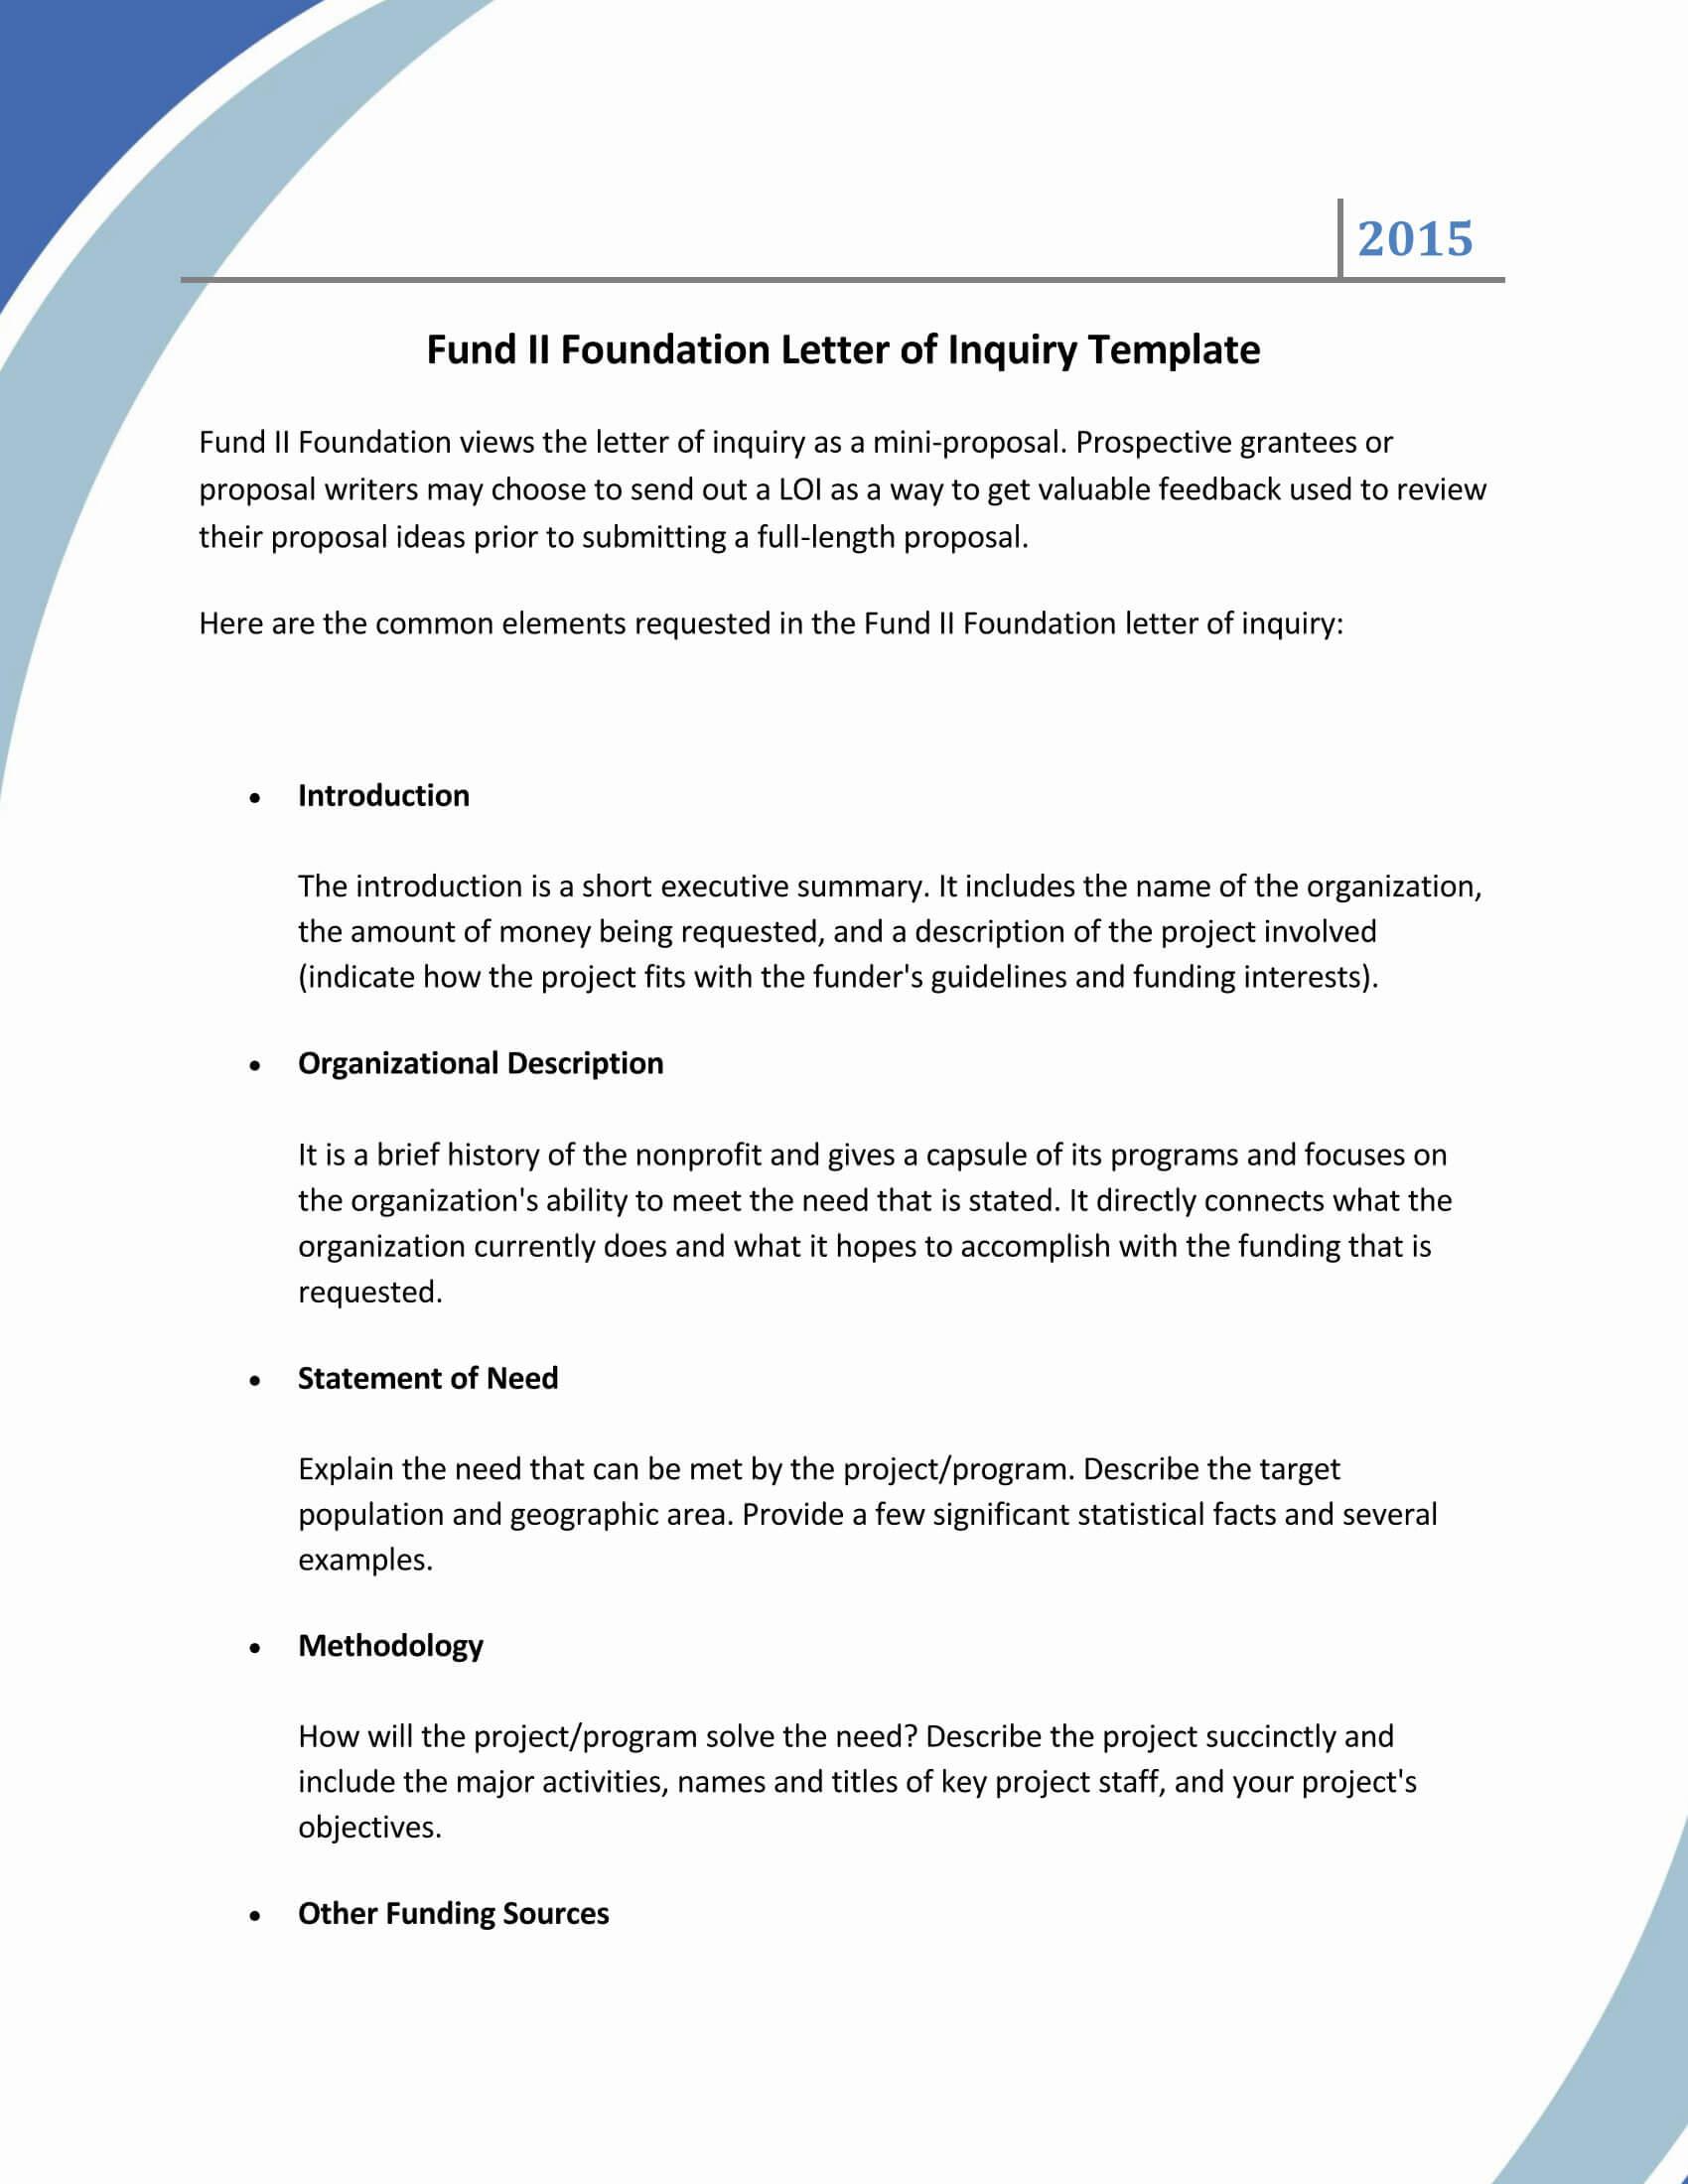 Grant Request Letter Sample 08